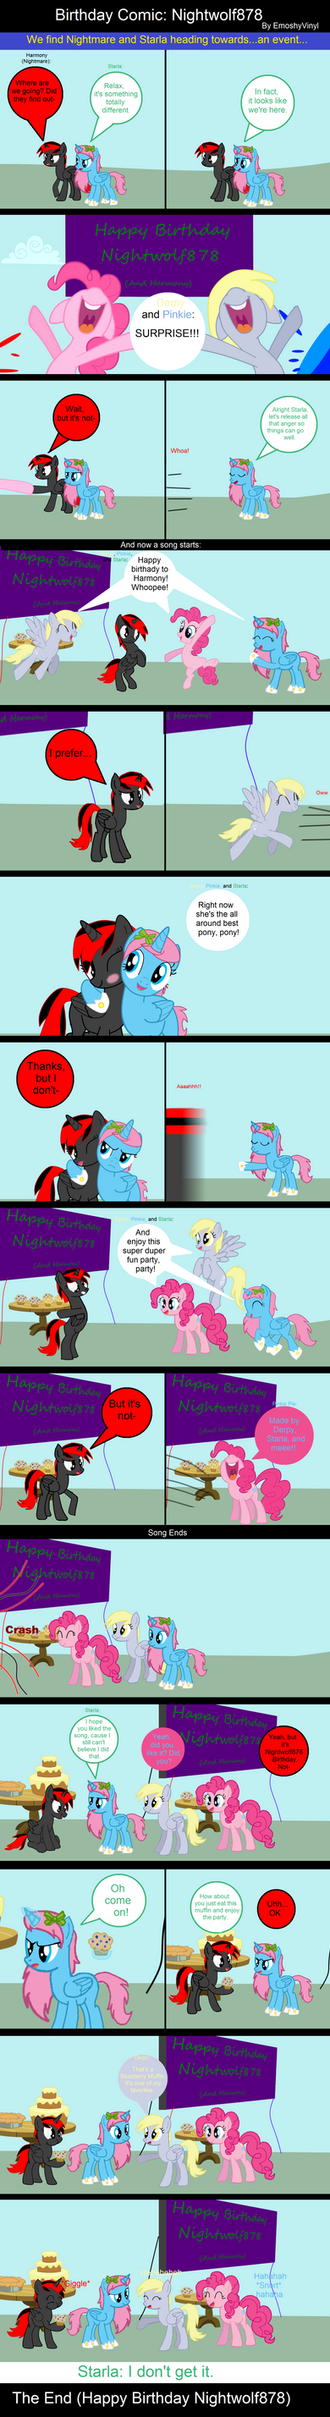 Birthday Comic: Nightwolf878 by EmoshyVinyl